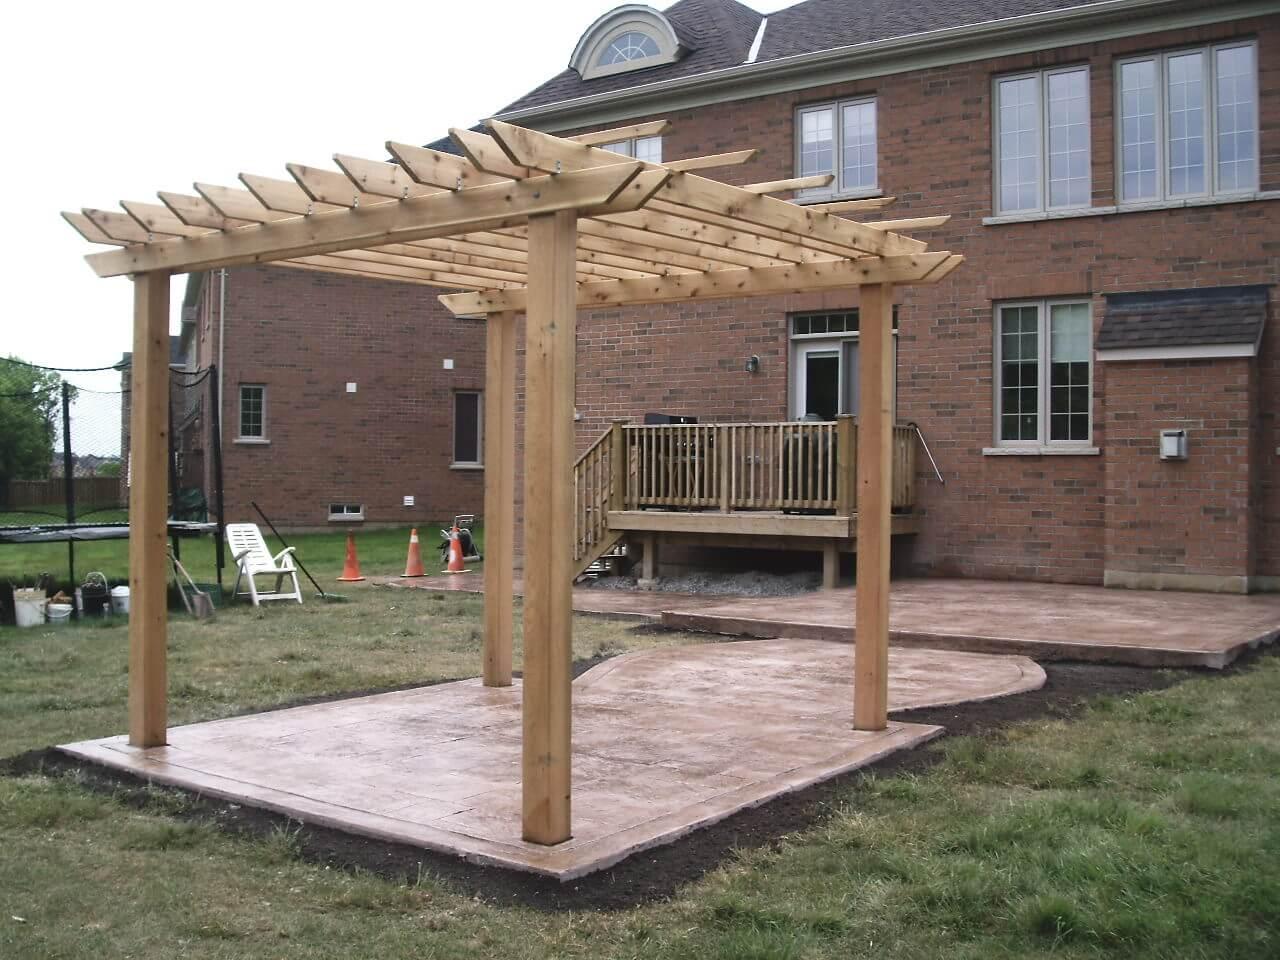 Stamped-Concrete-Construction-Contractor-Toronto-Pergola-Rd-58